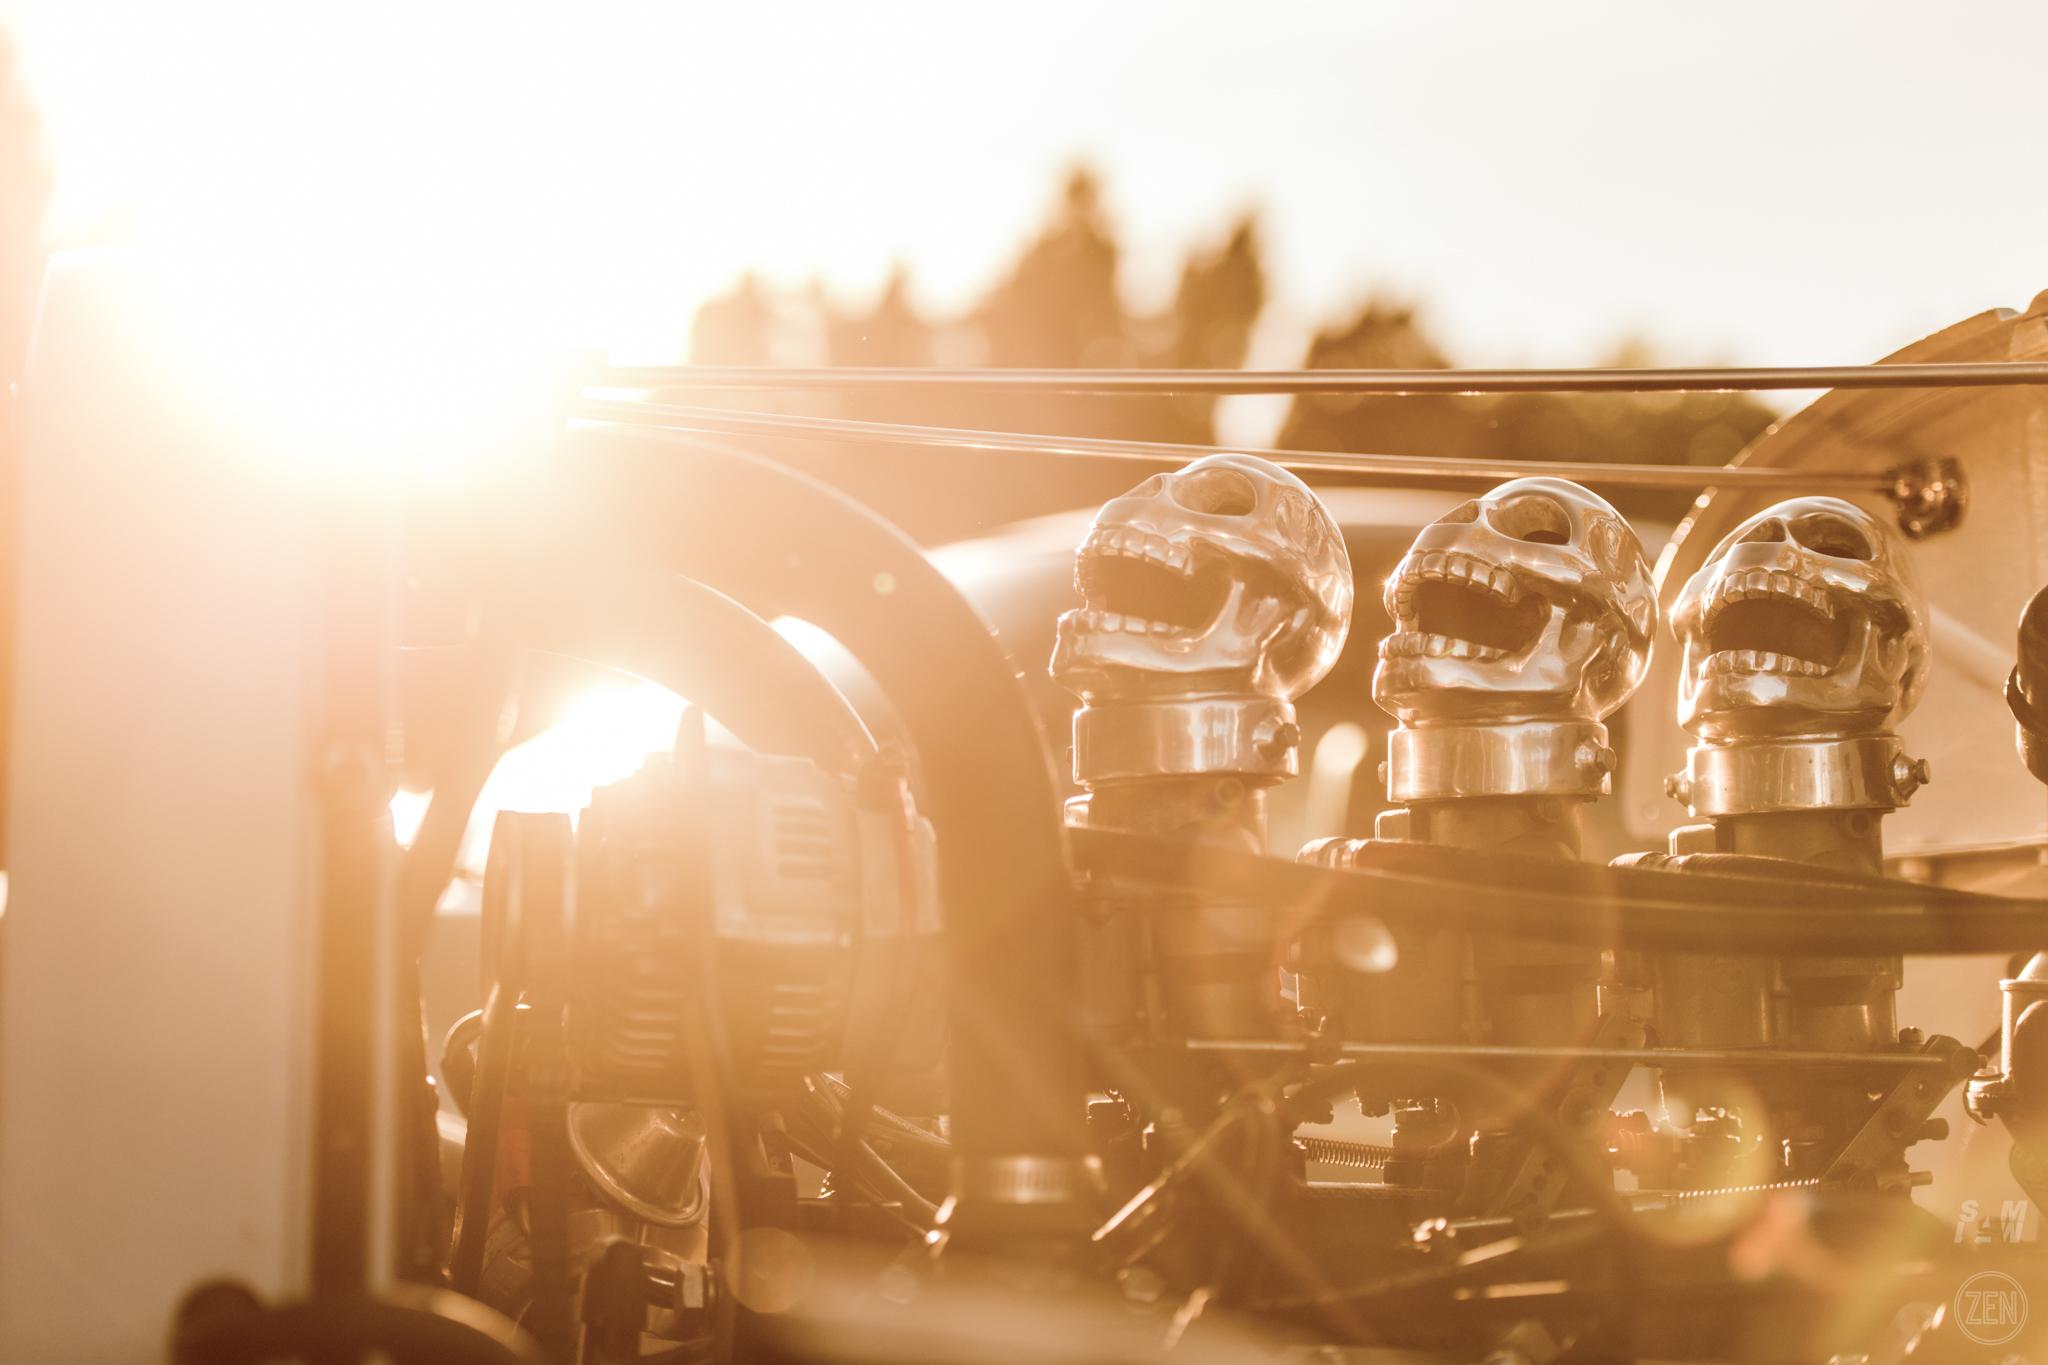 2019-10-27 - Autohaus Porsches & Coffee 049